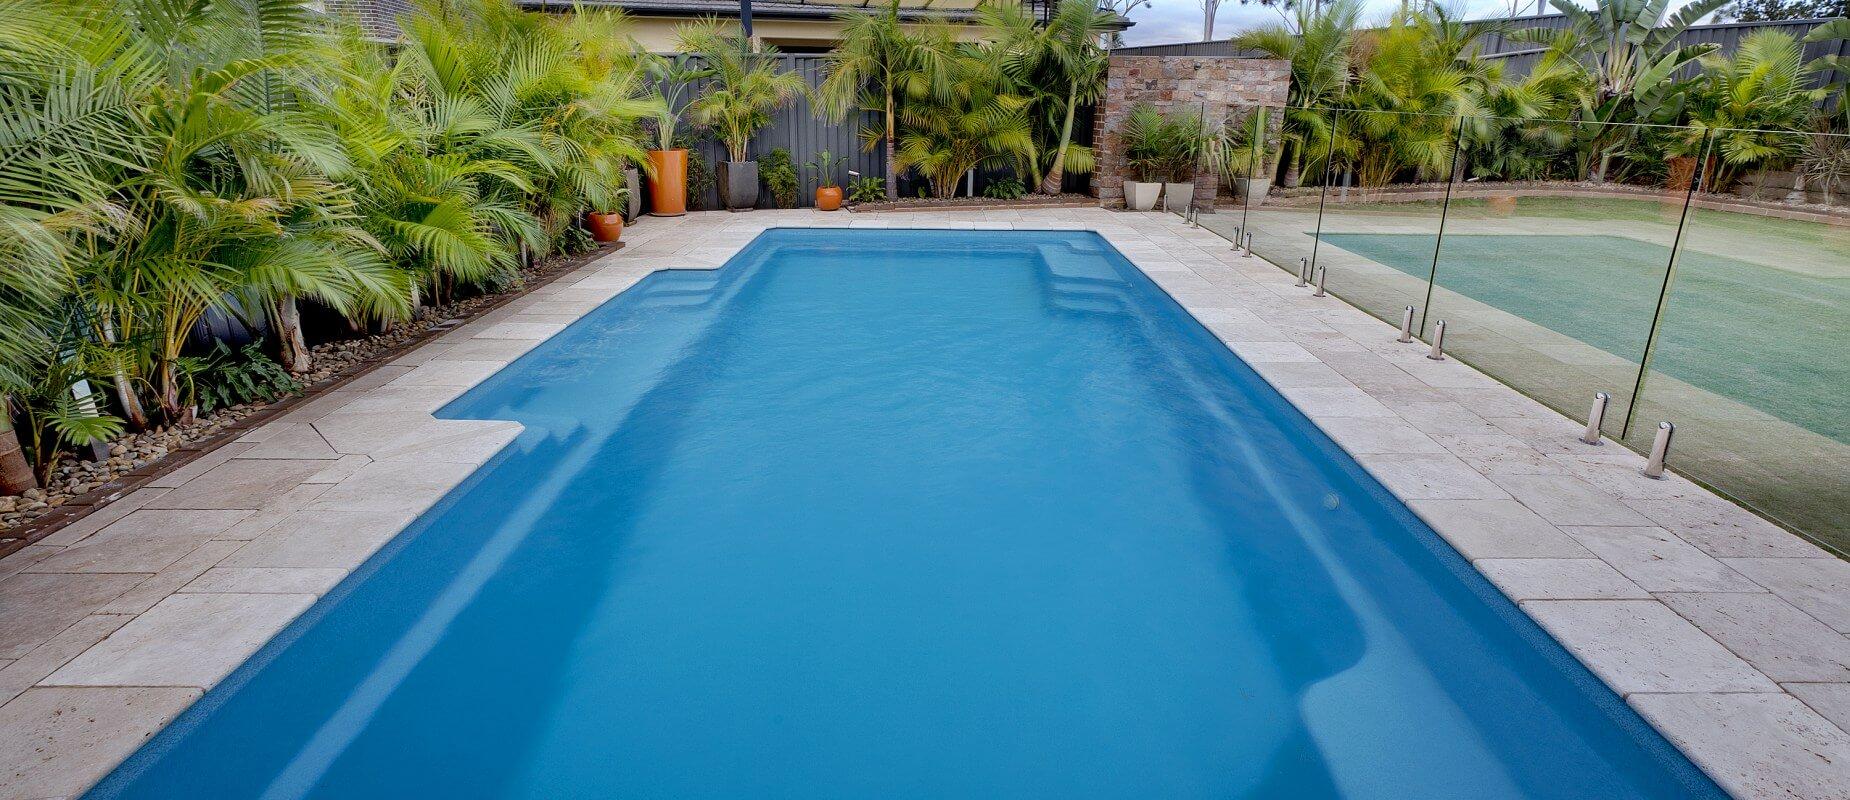 piscina de lux modele frumoase 31